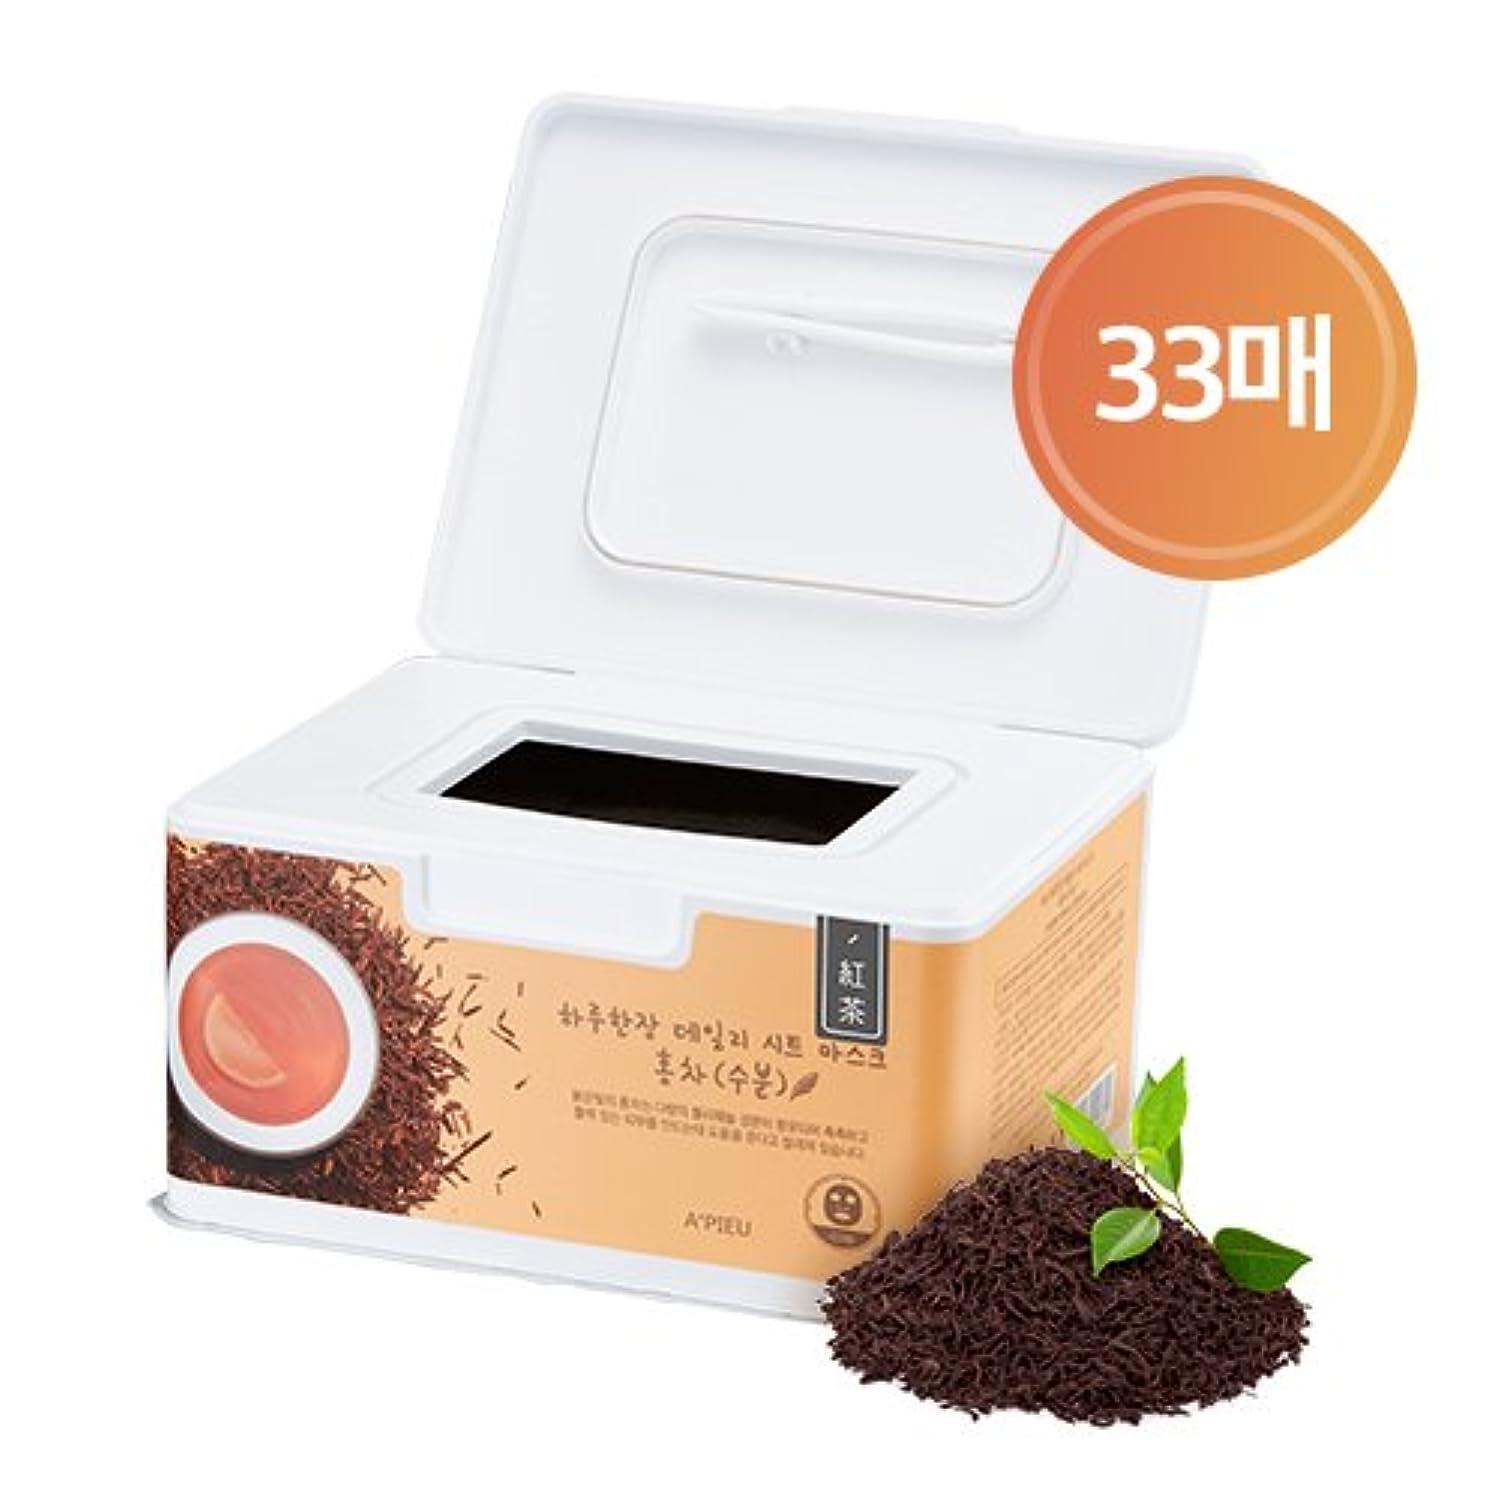 APIEU DAILY Sheet Mask _ Black Tea (Hydrating) / [オピュ/アピュ] デイリーシートマスク_紅茶(ハイドレーティング) [並行輸入品]